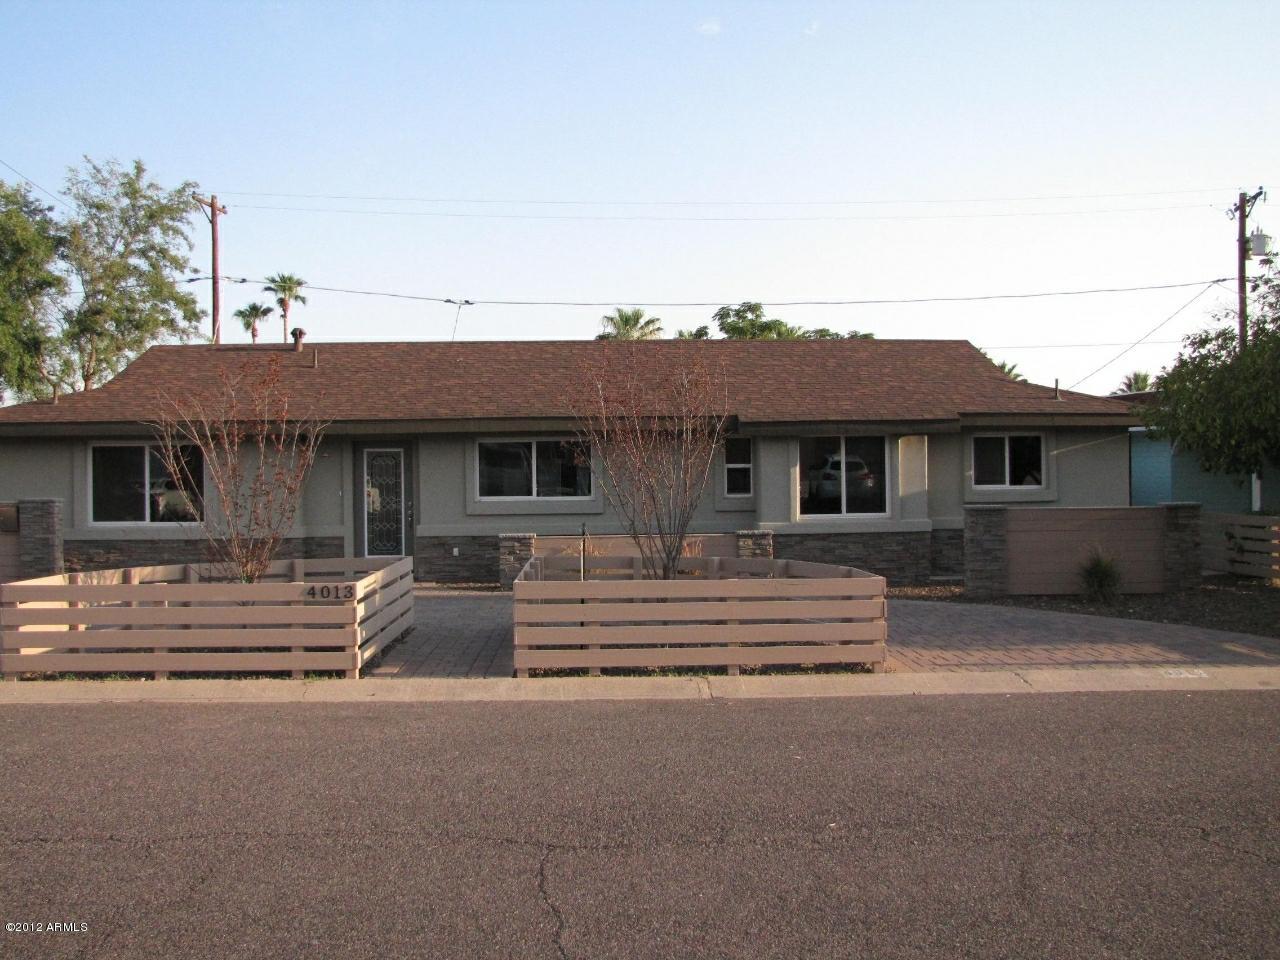 4013 E Heatherbrae Drive, Phoenix, AZ 85018 (MLS #4823114) :: The Daniel Montez Real Estate Group